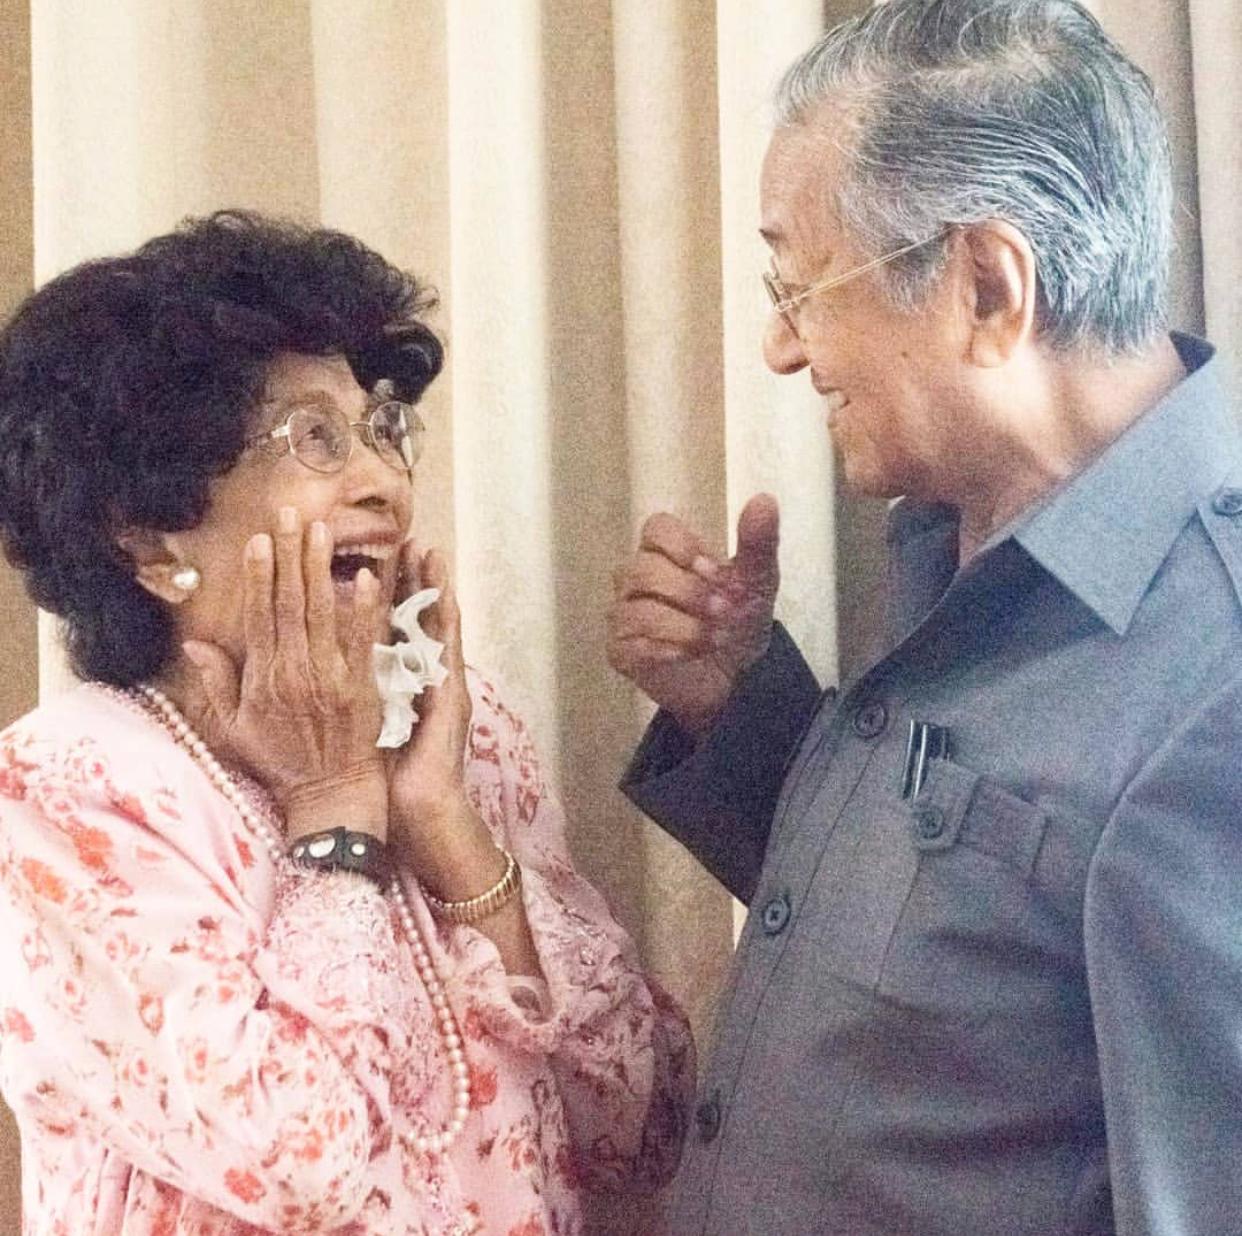 Pengikut Instagram Cecah 1 Juta Tun Mahathir Kongsi Reaksi Comel Isteri